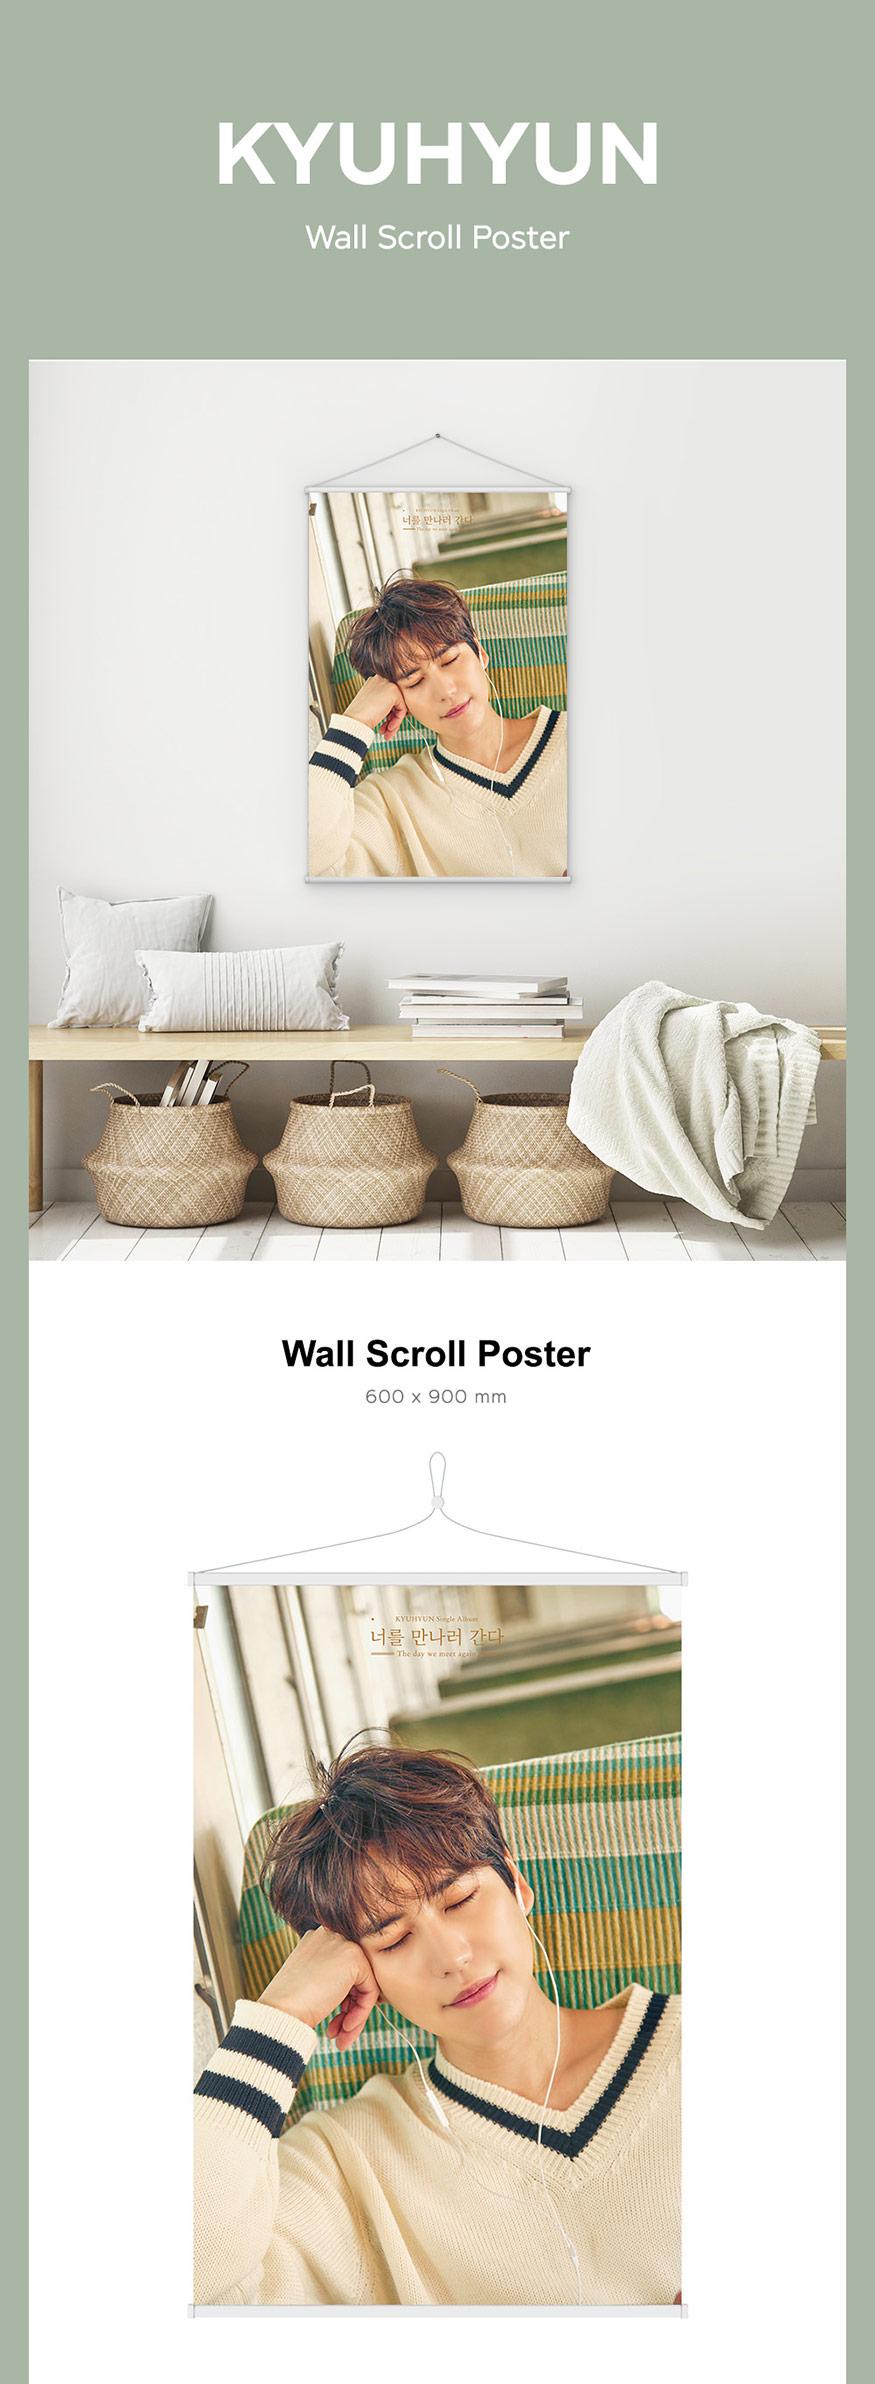 kyuhyun_wallscroll_poster-1